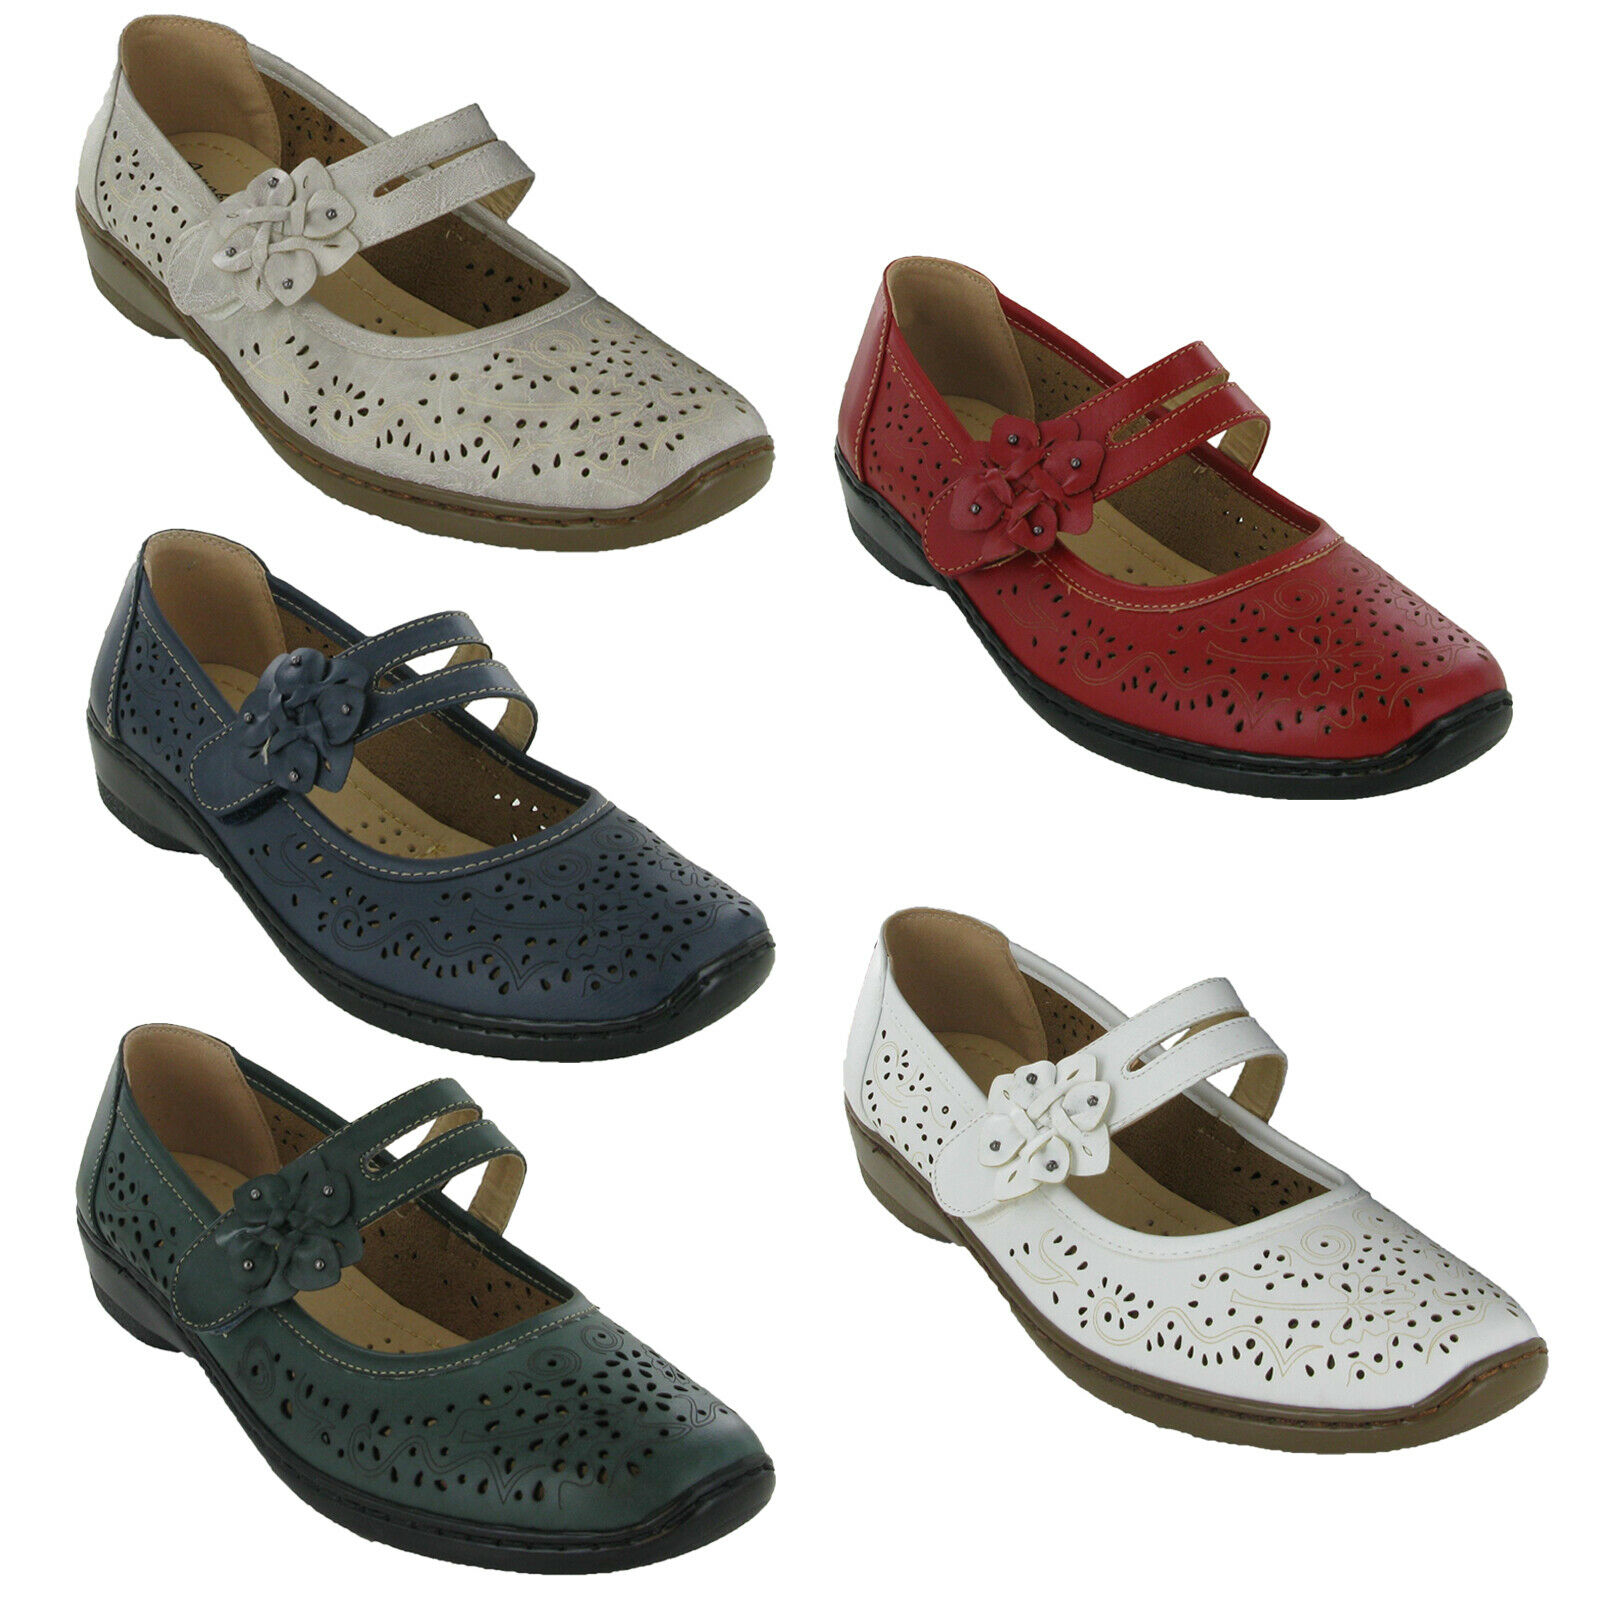 Annabelle Womens Tamsin Shoe Plus Comfort Low Wedge Heel Lightweight UK3 - 8